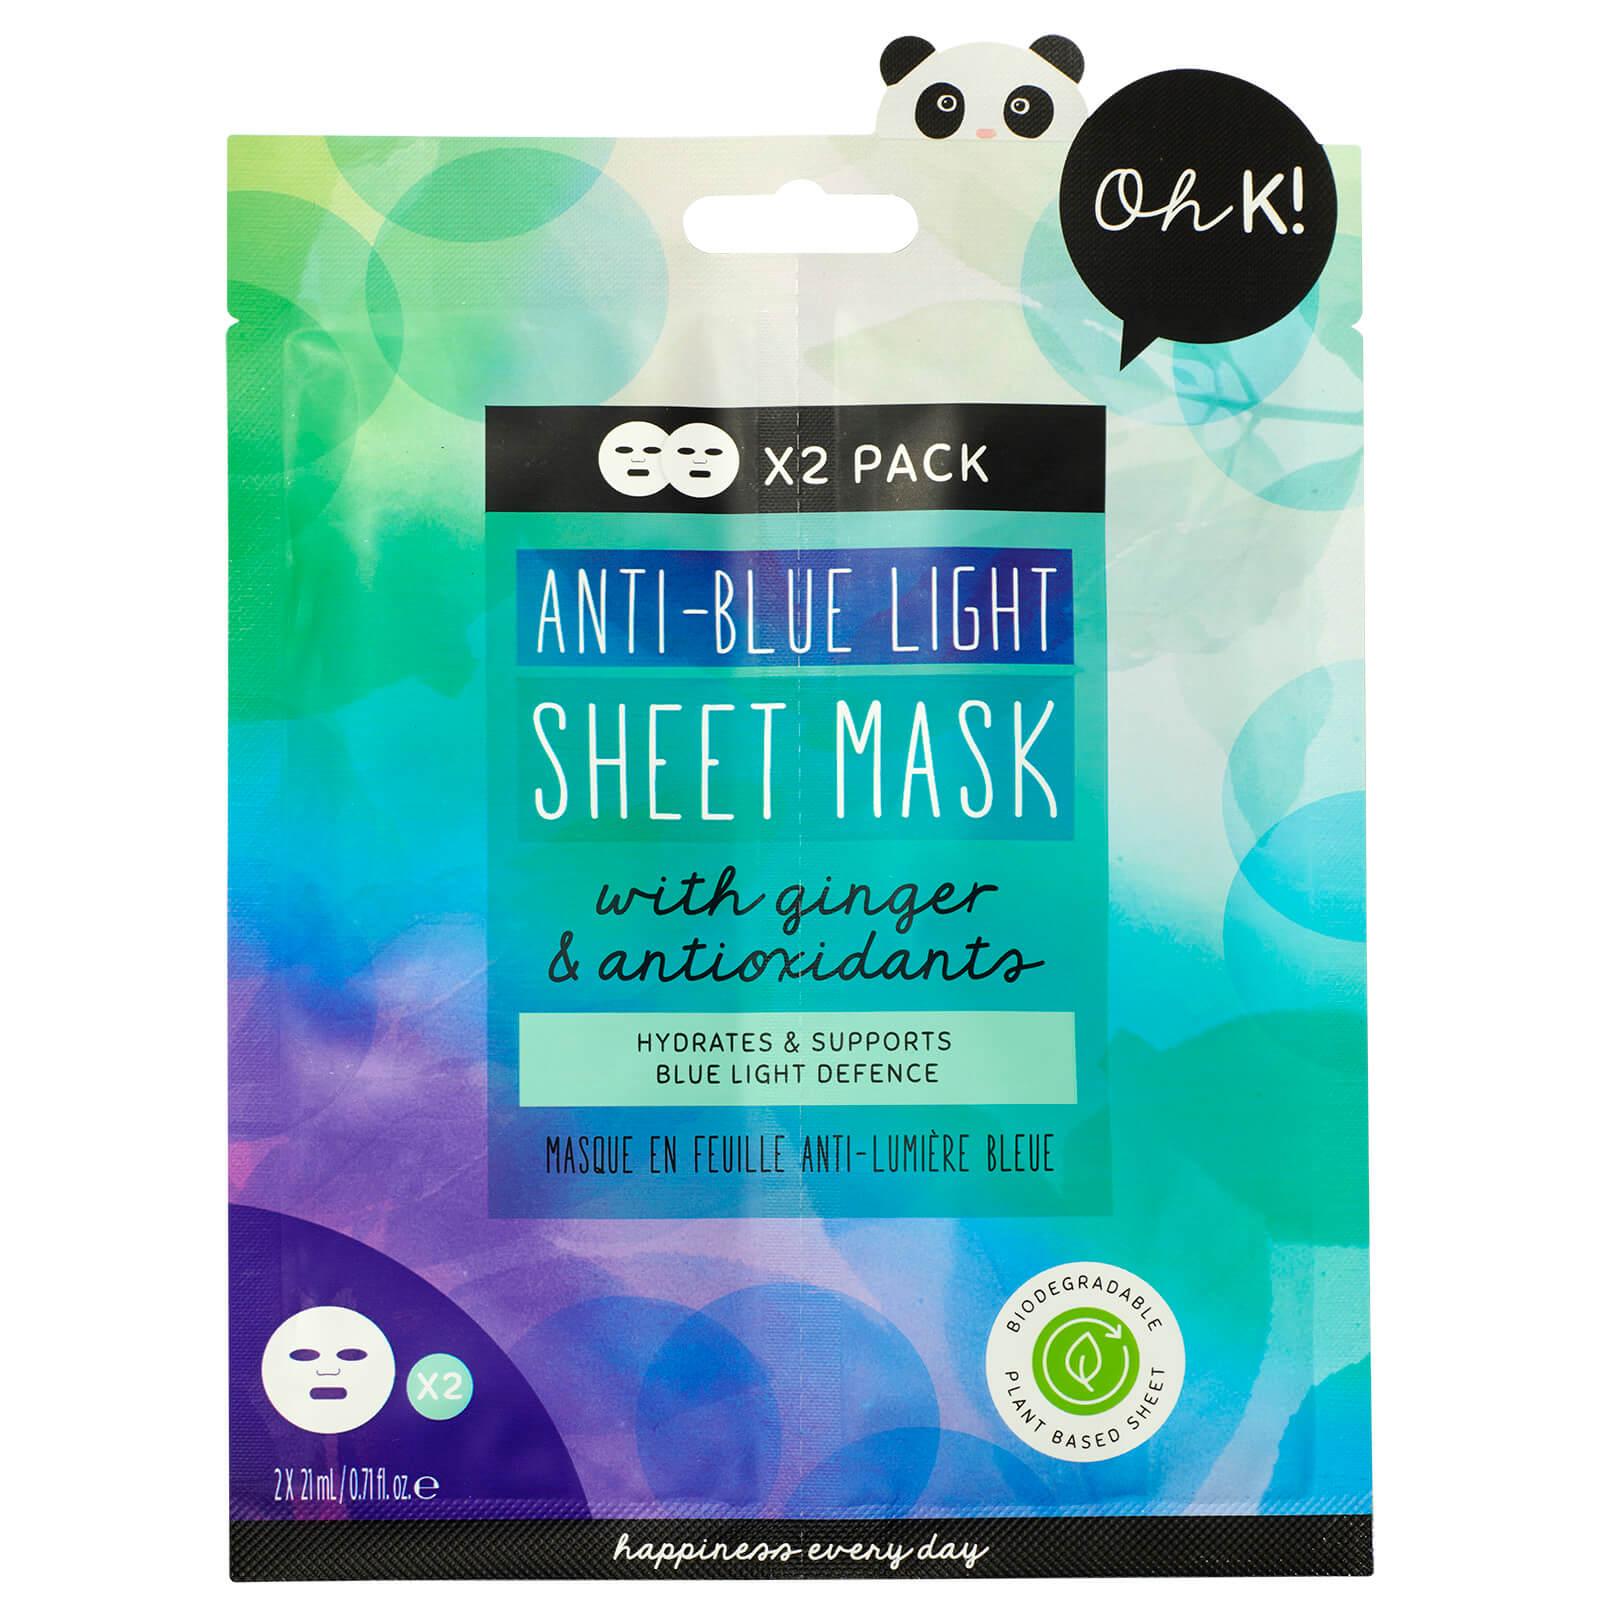 oh k! anti blue light sheet mask duo 42ml